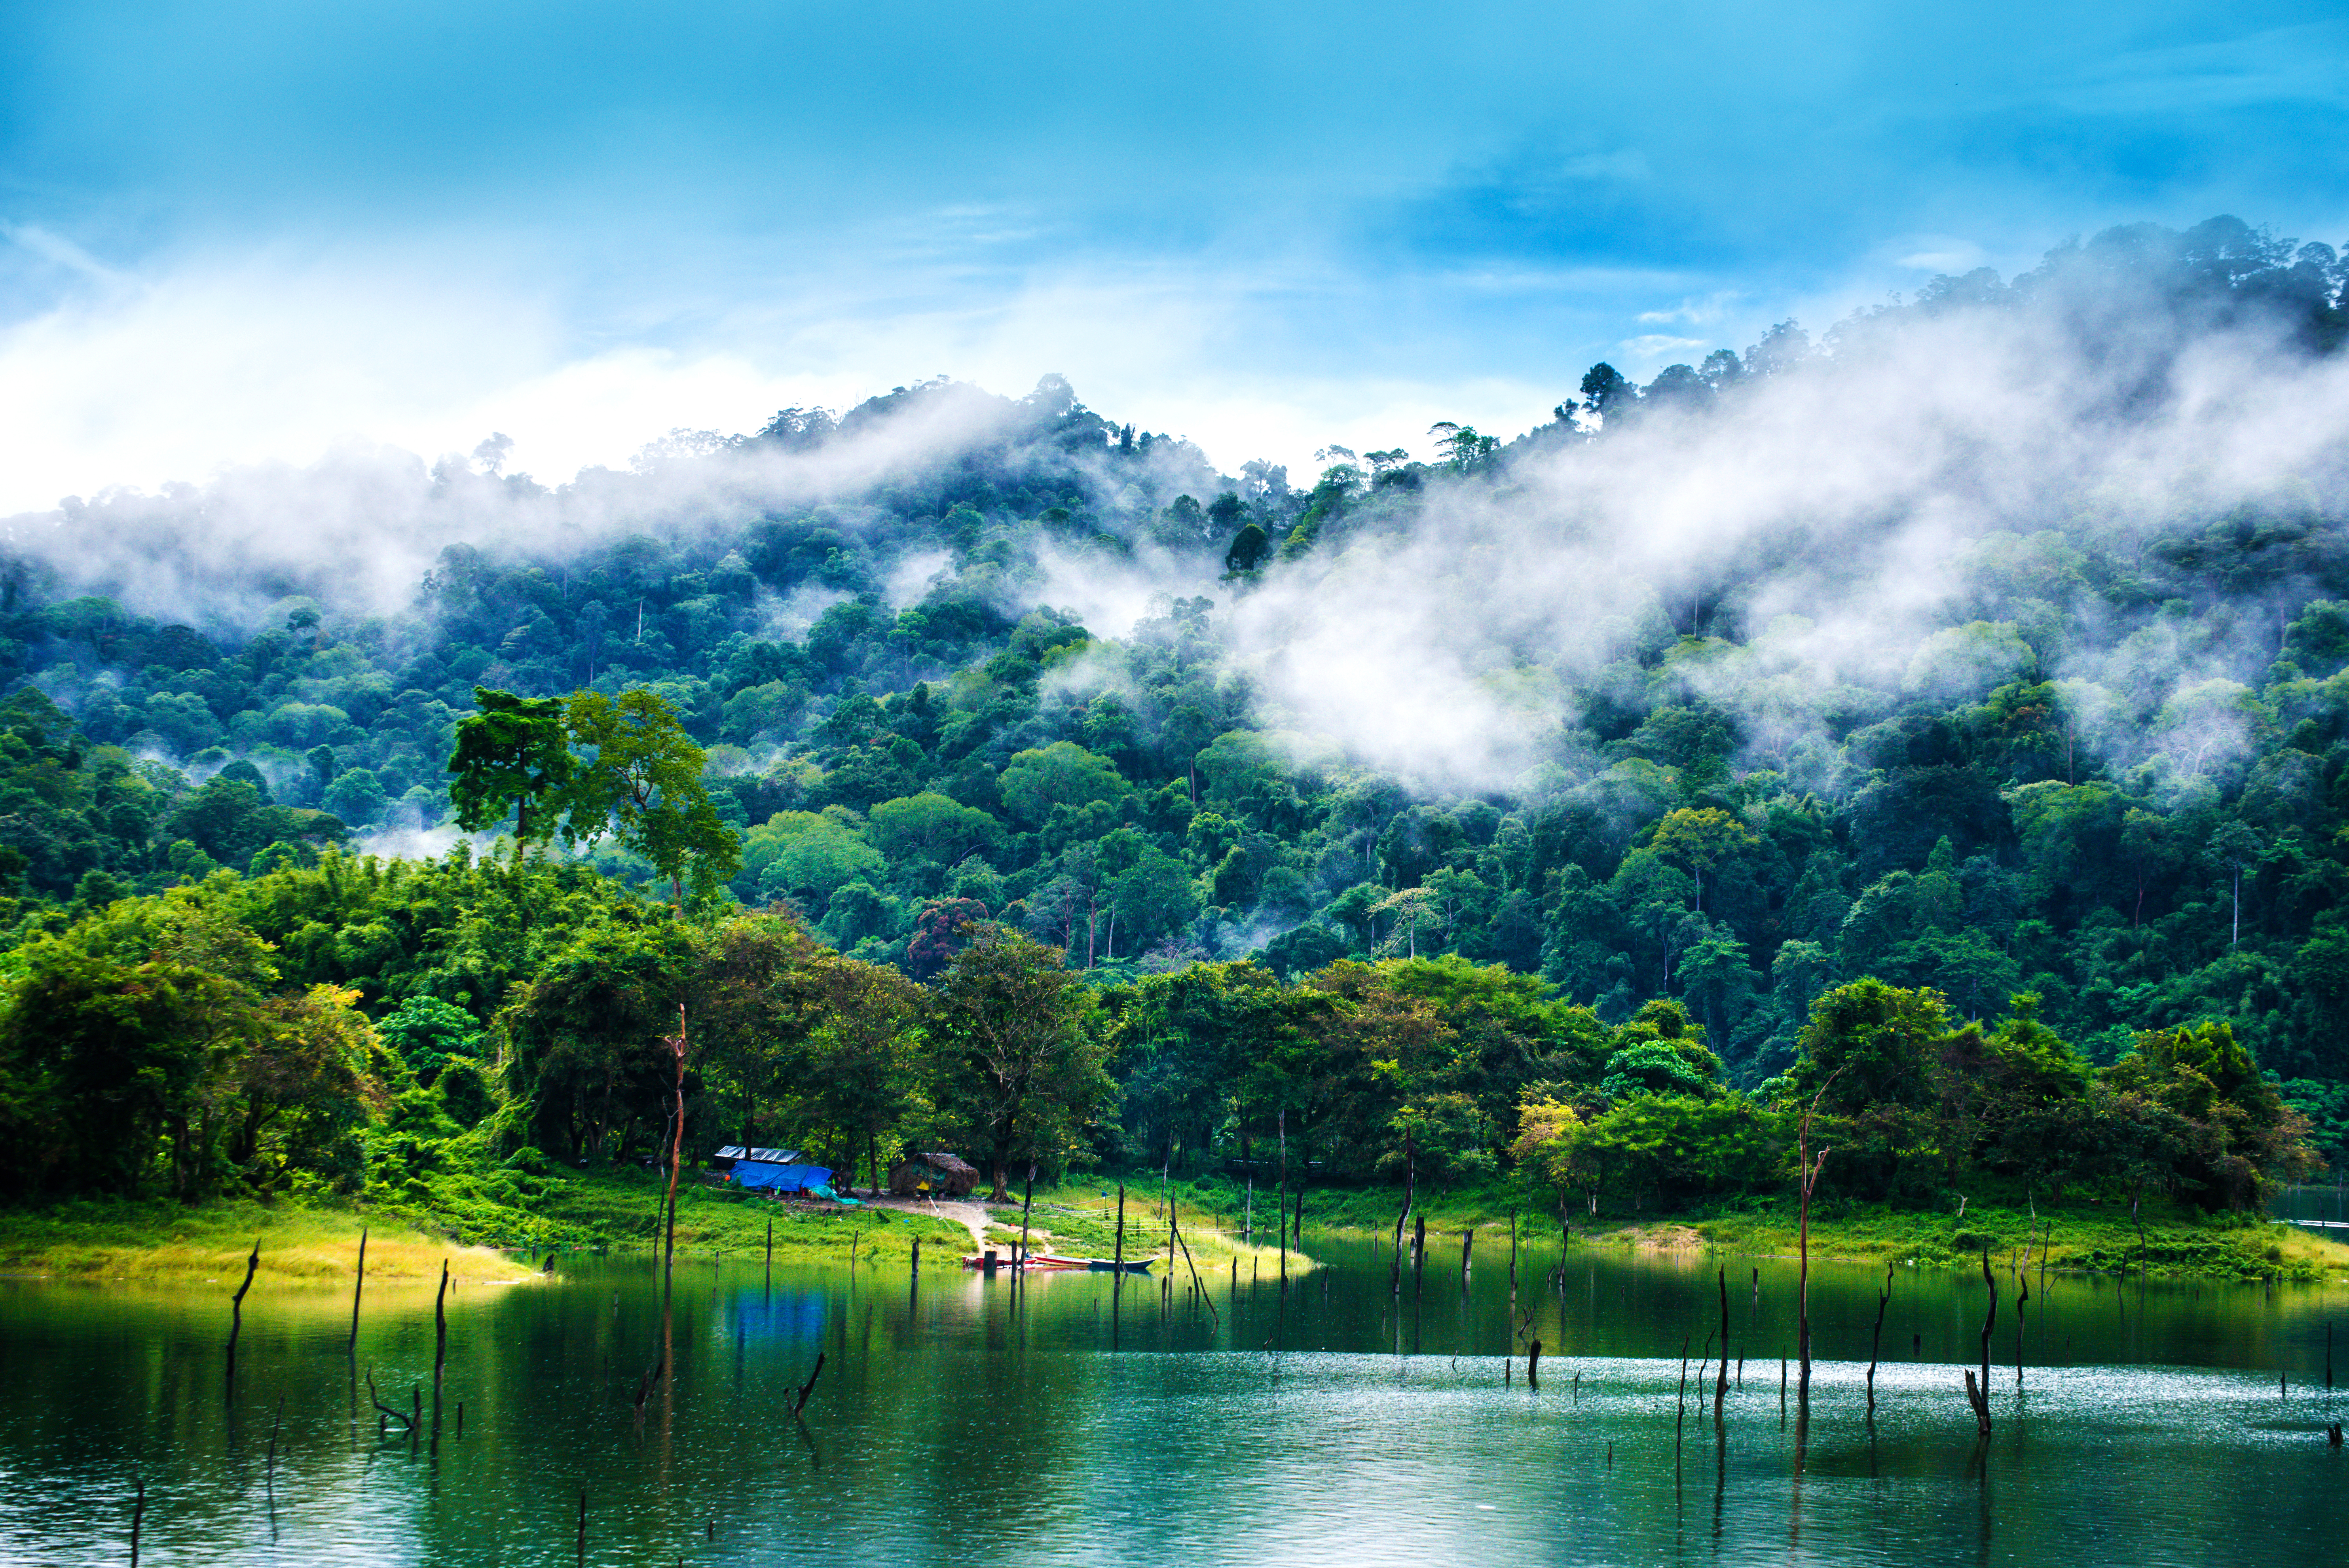 Taman Negeri Royal Belum Wikipedia Bahasa Melayu Ensiklopedia Bebas